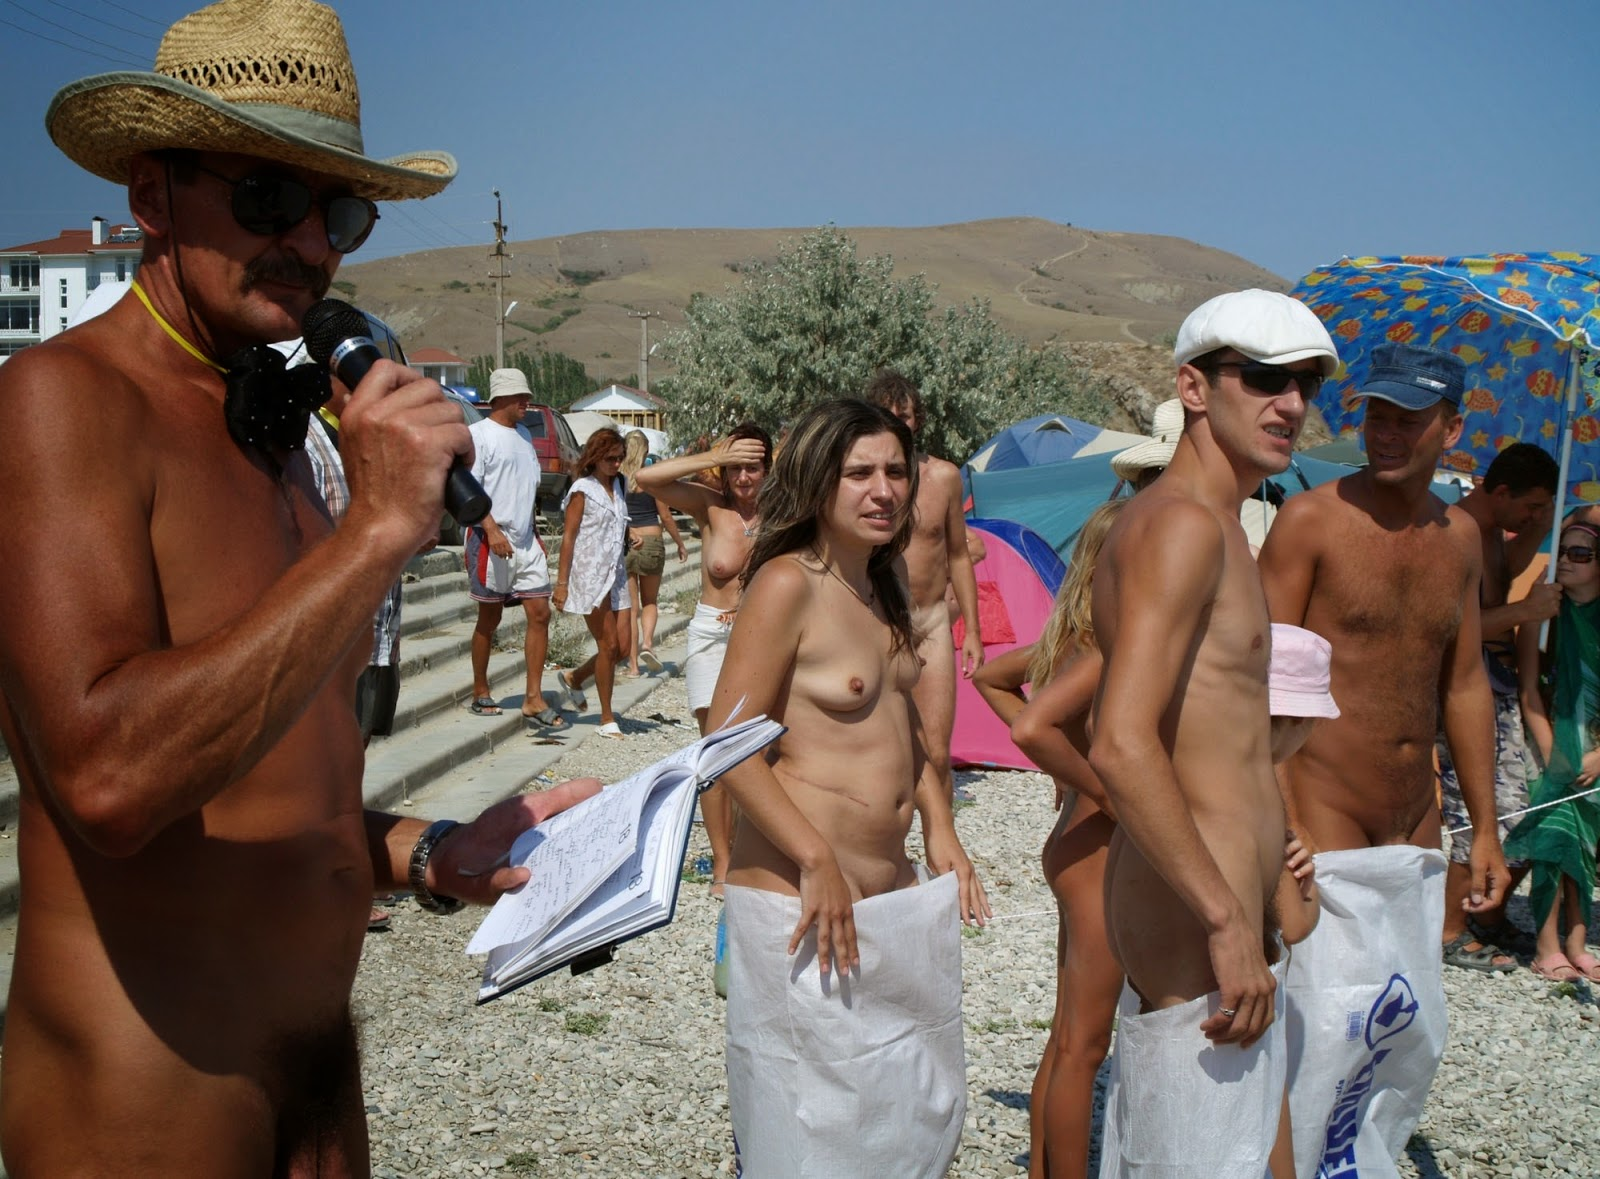 Memek nudis family japan